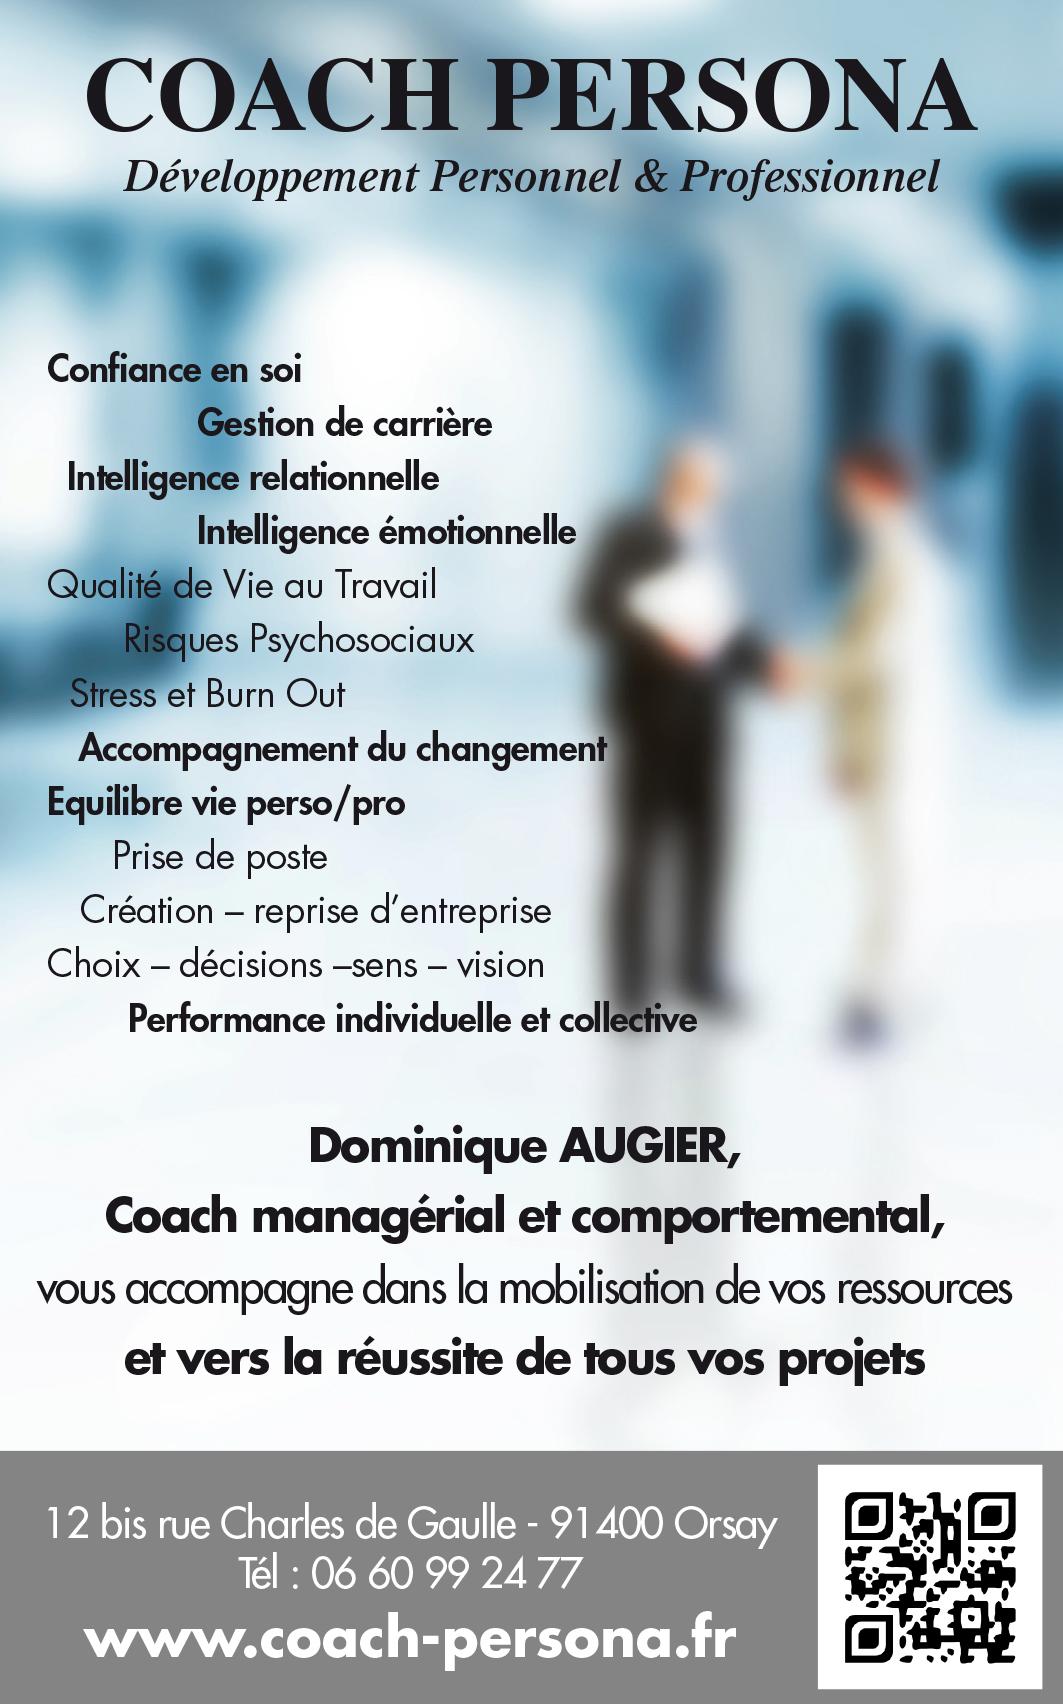 dominique augier - cv - consultant - formateur